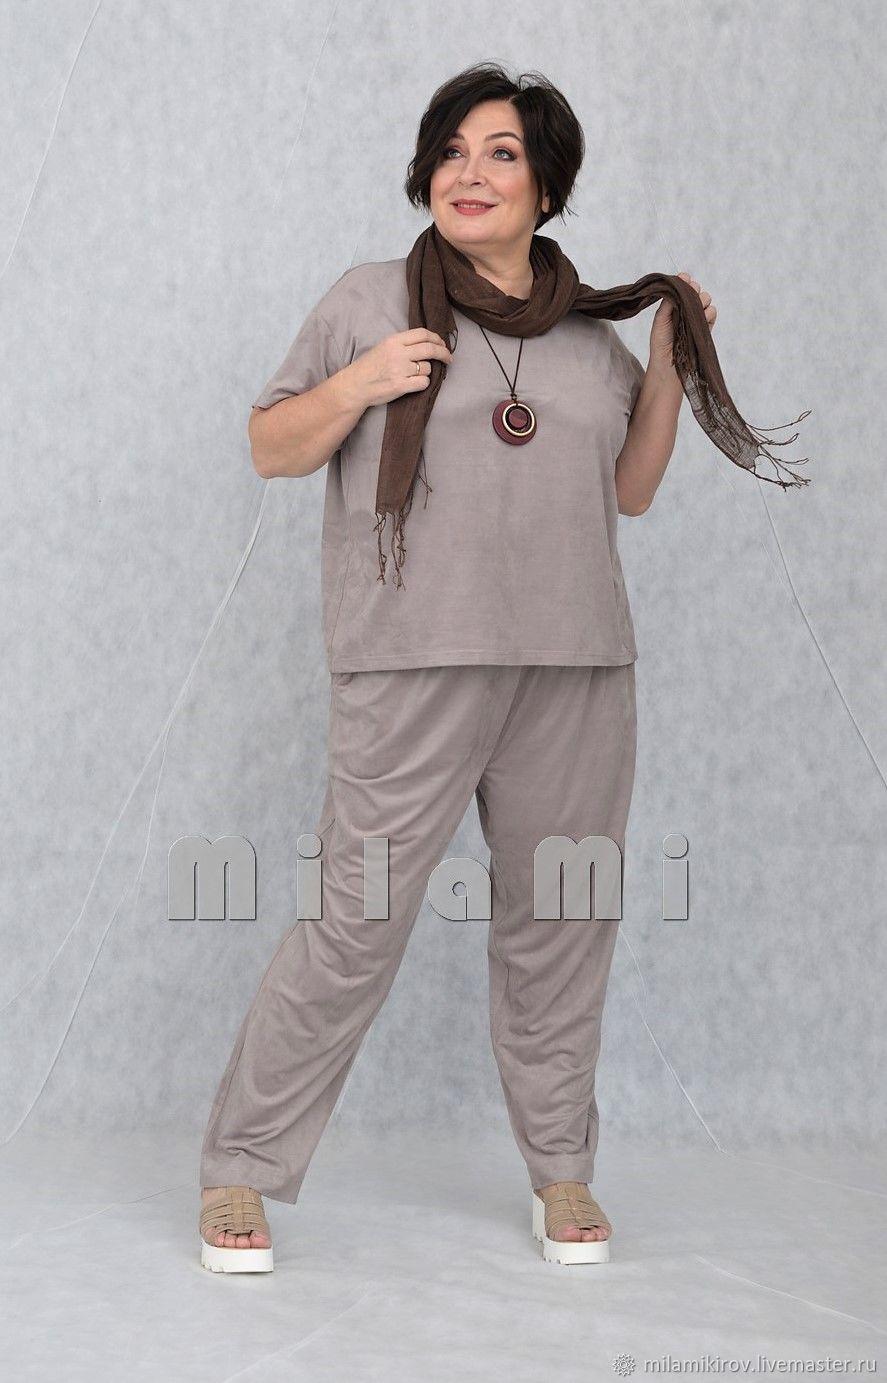 Блуза короткая широкая трикотаж замша серая Арт. 3751, Блузки, Киров, Фото №1